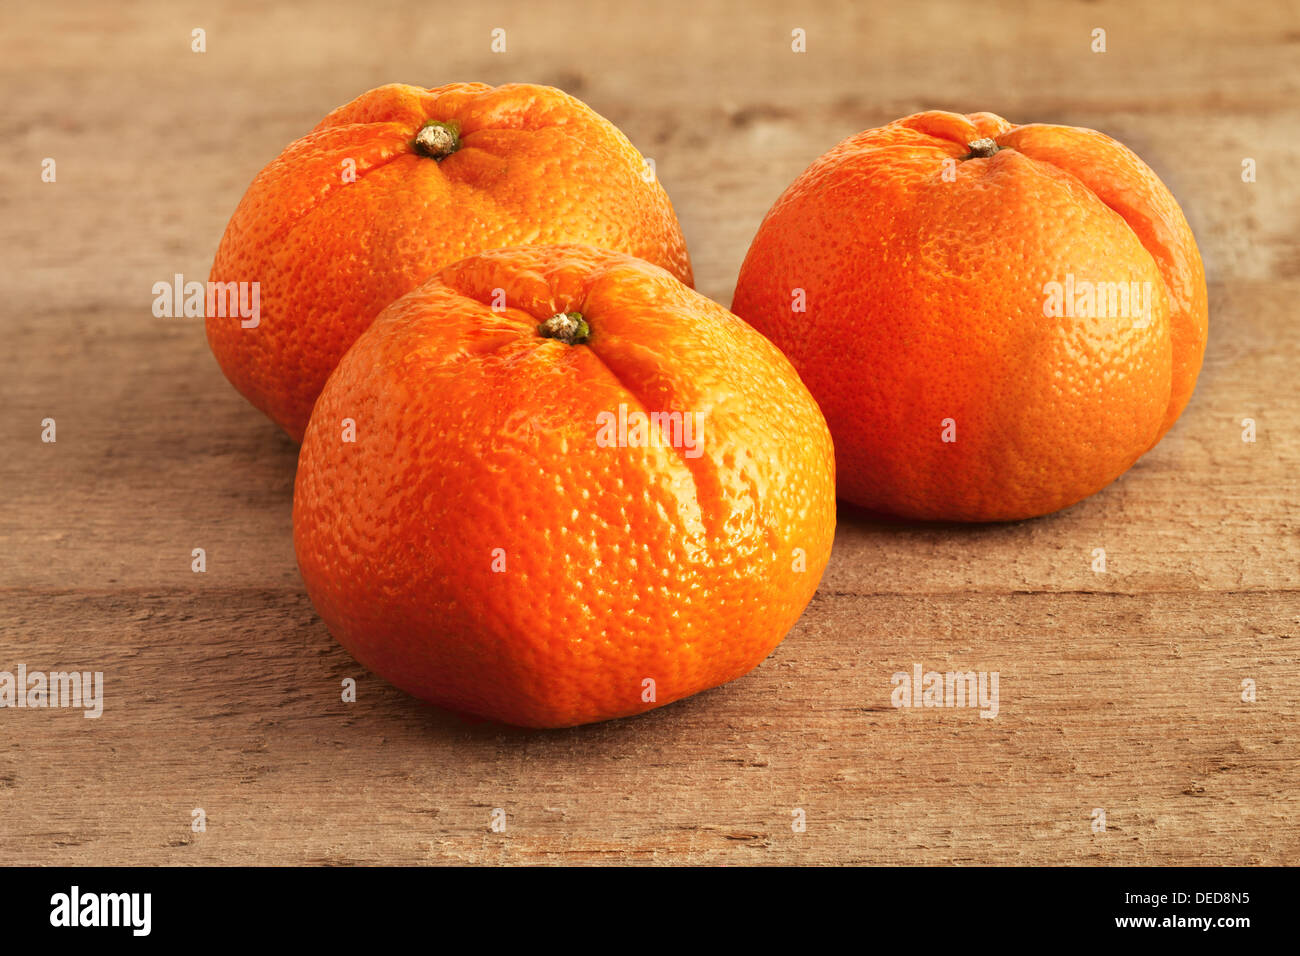 Mandarin Oranges - three mandarin oranges on a rustic wooden board. - Stock Image